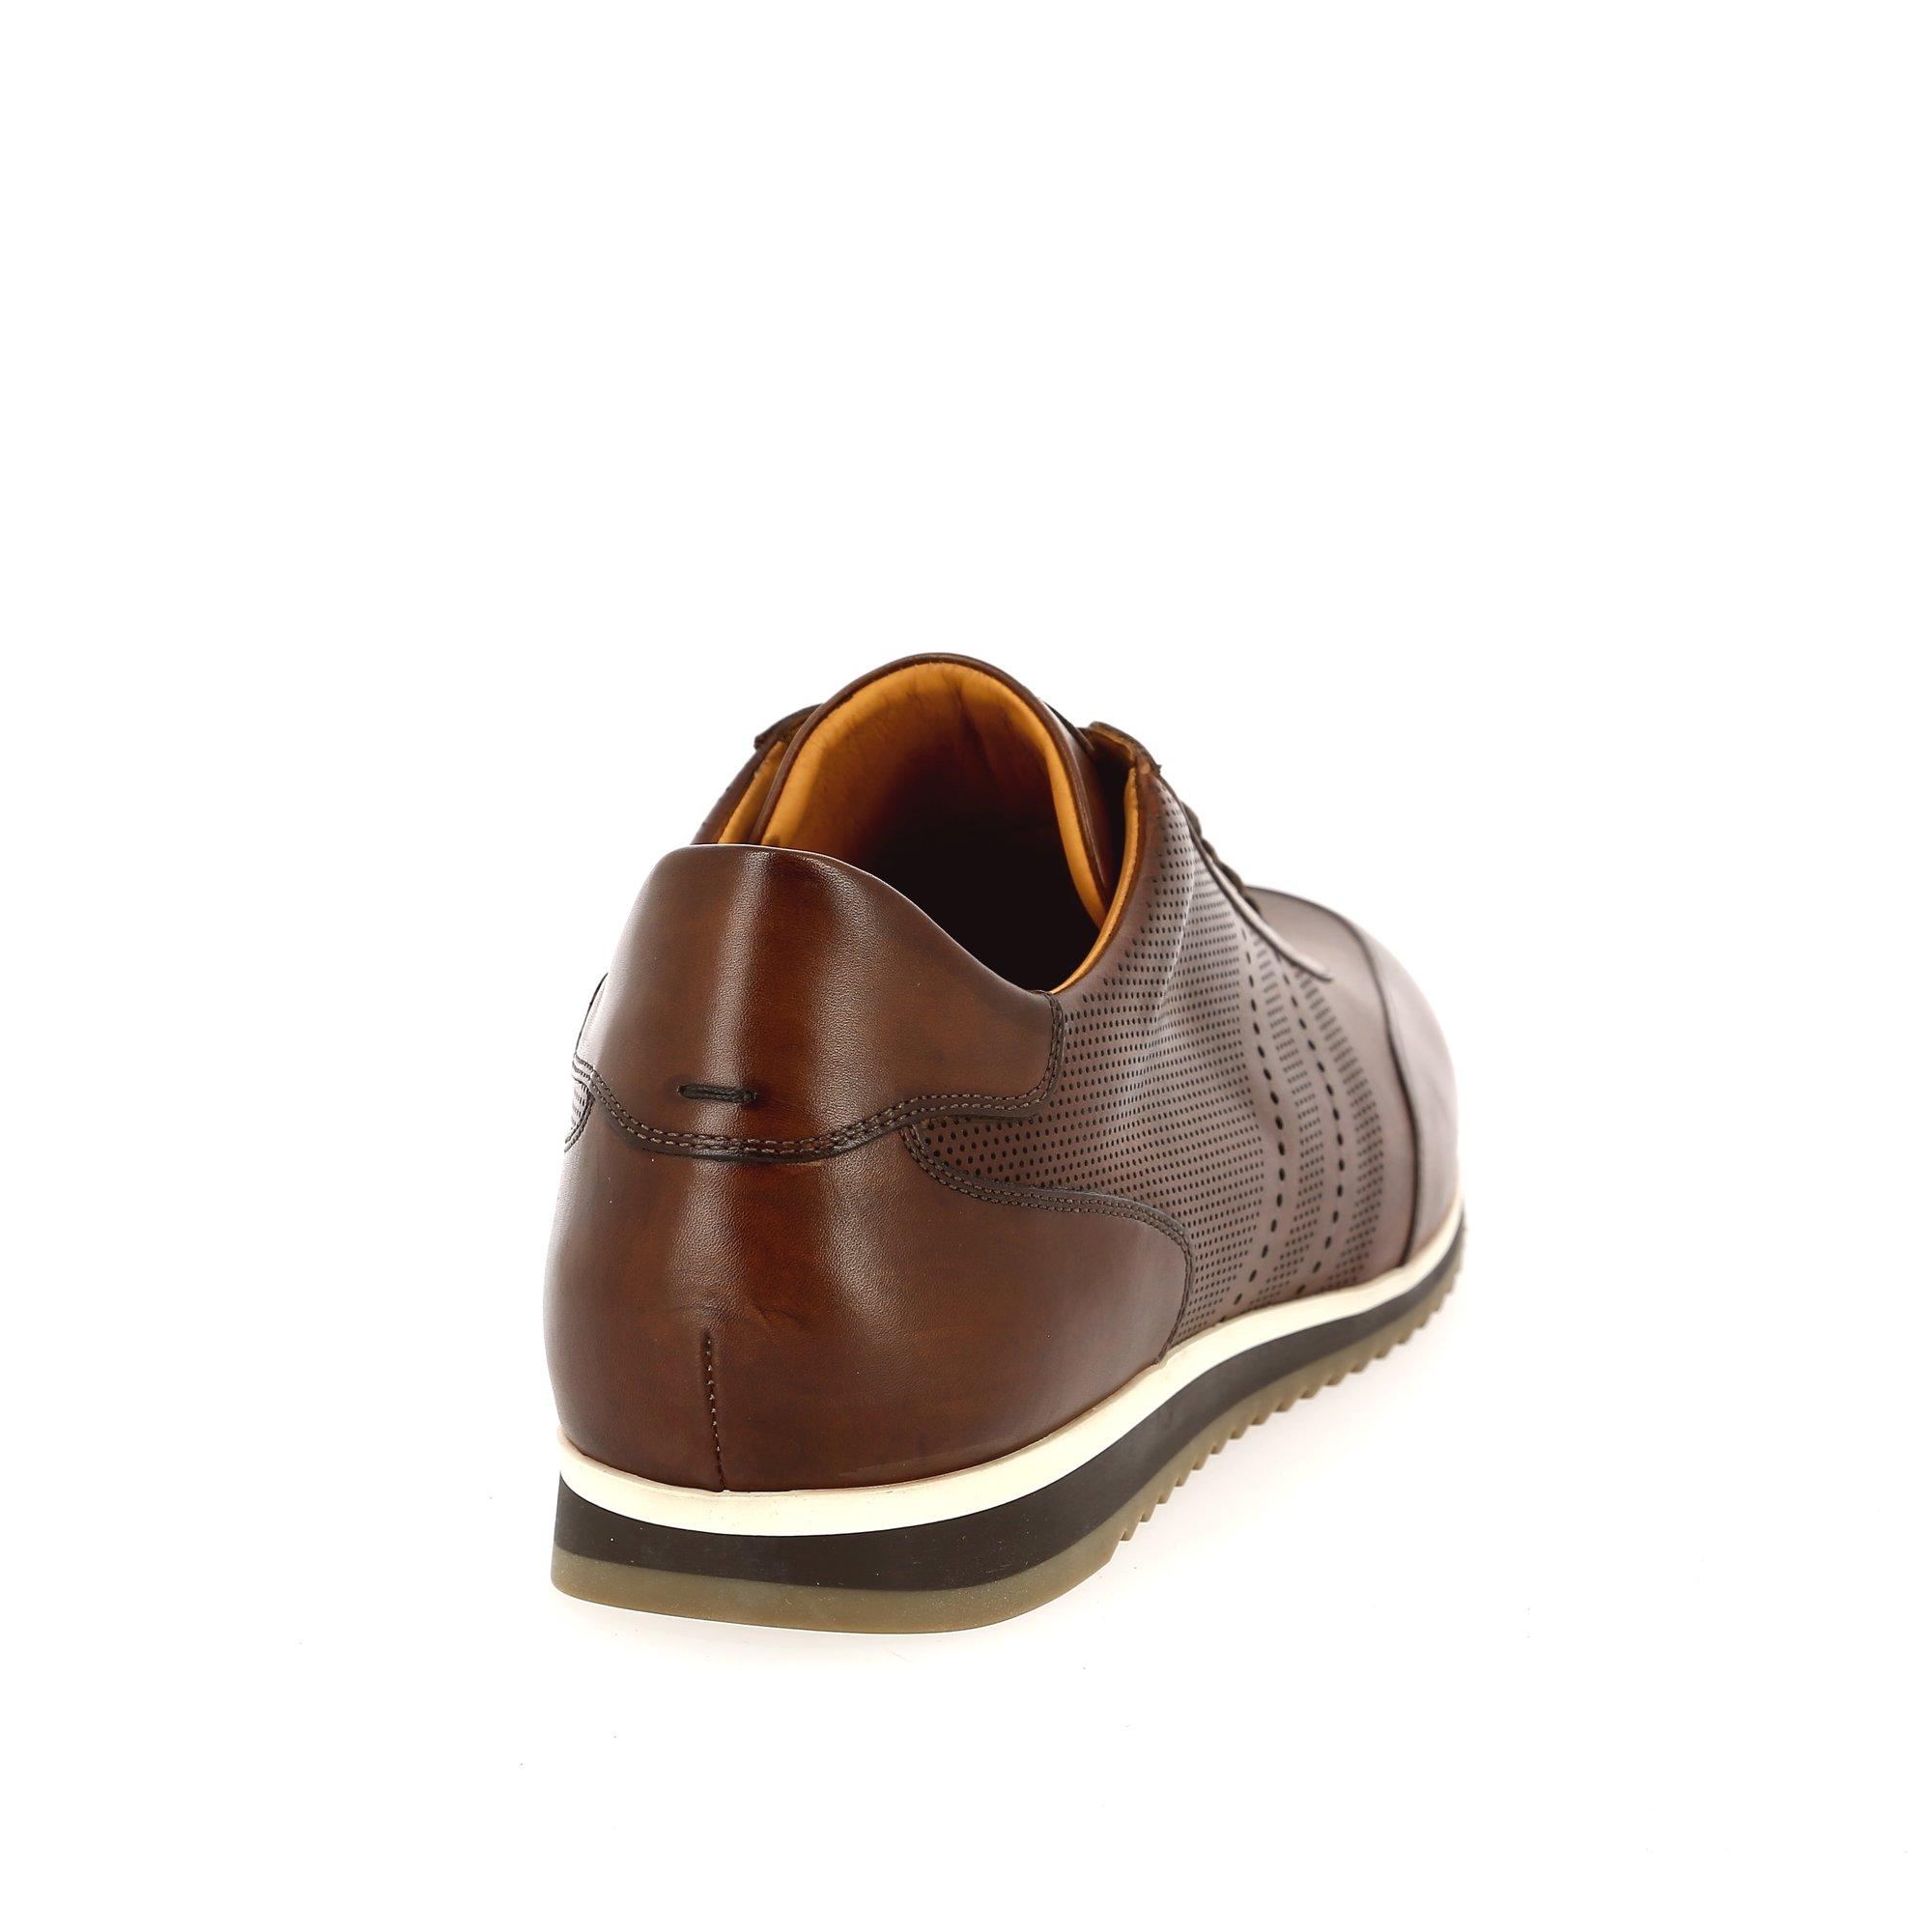 Magnanni Sneakers cognac